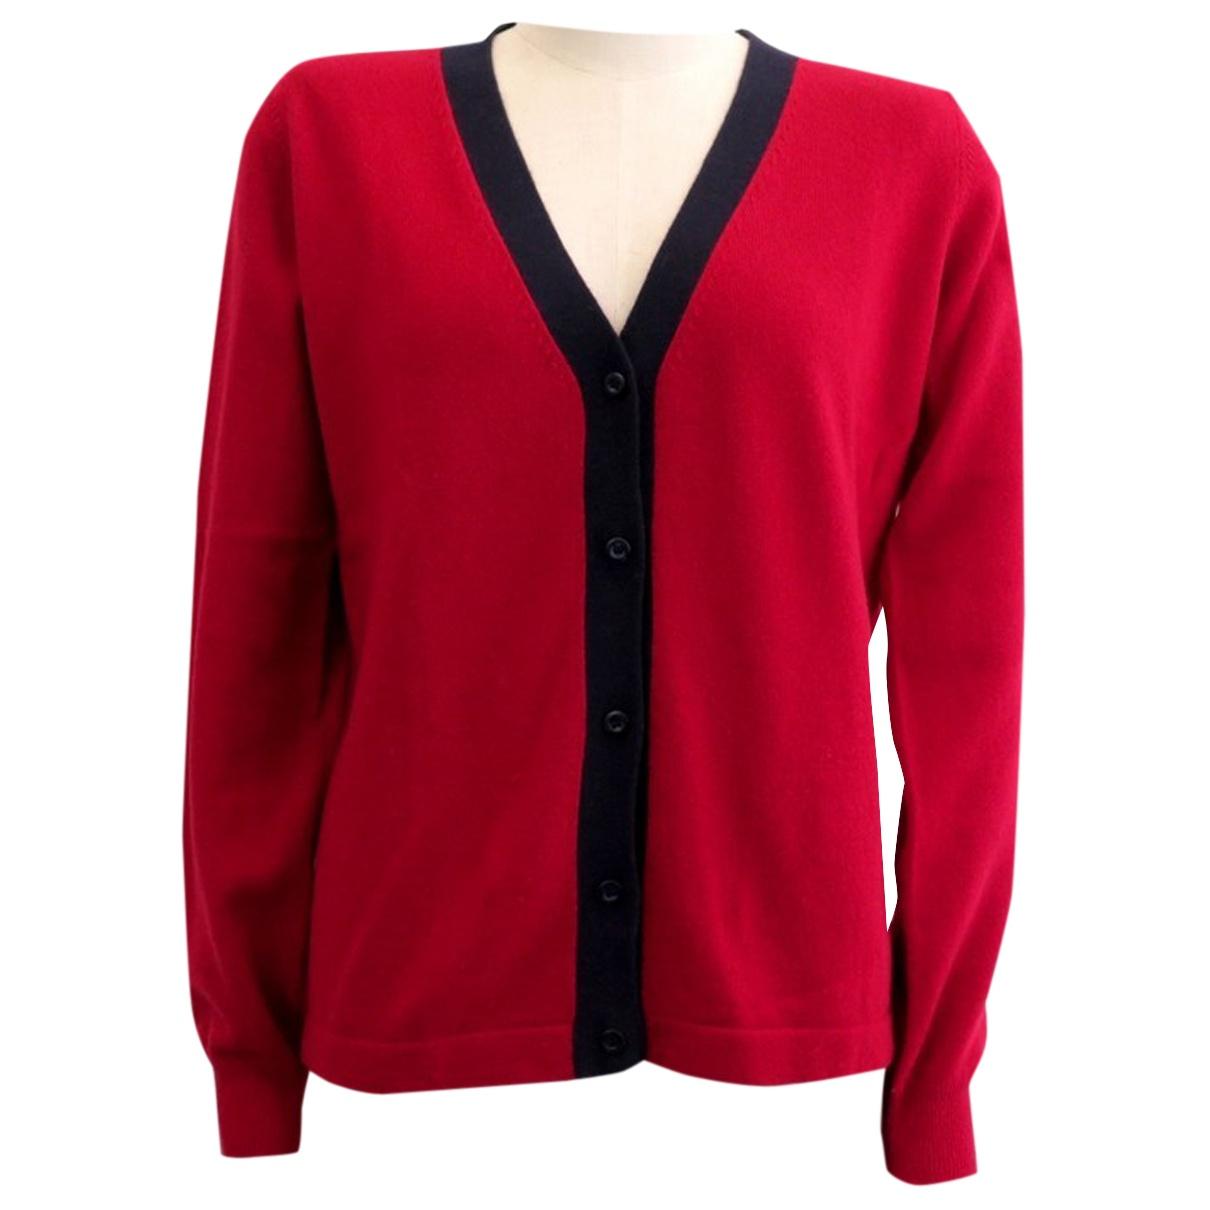 Prada N Red Wool Knitwear for Women M International